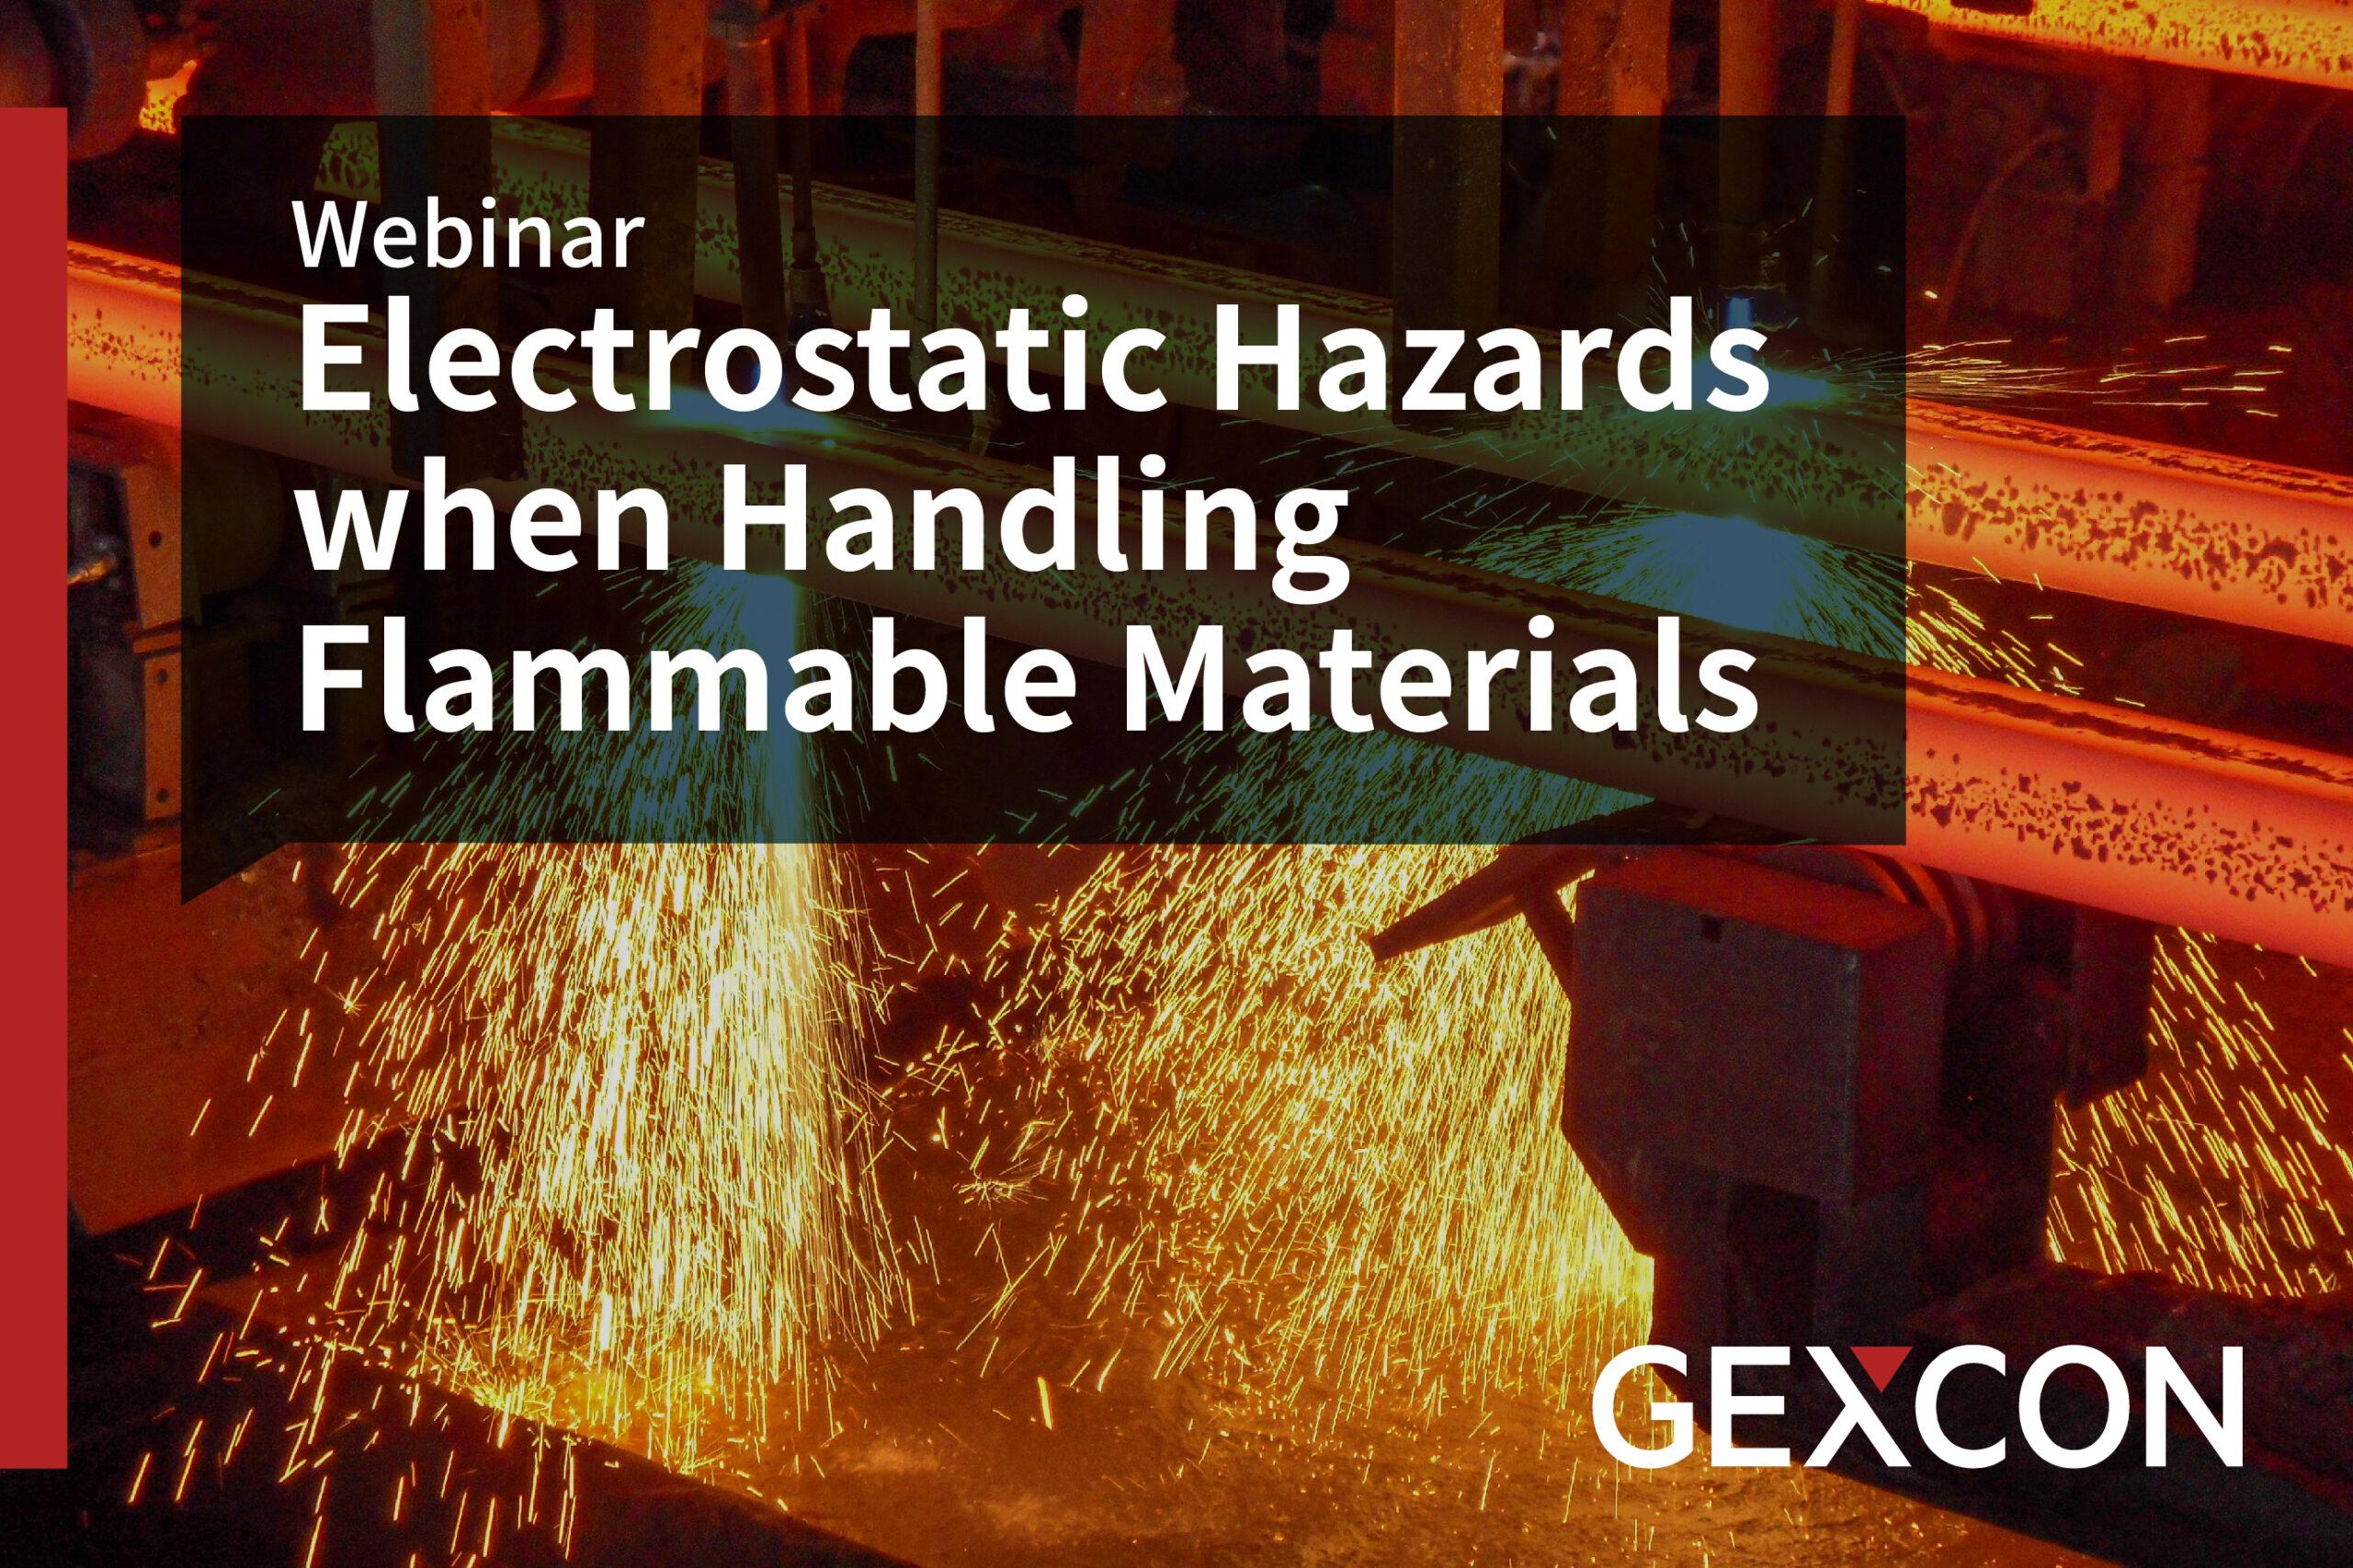 Webinar - Electrostatic Hazards when Handling Flammable Materials